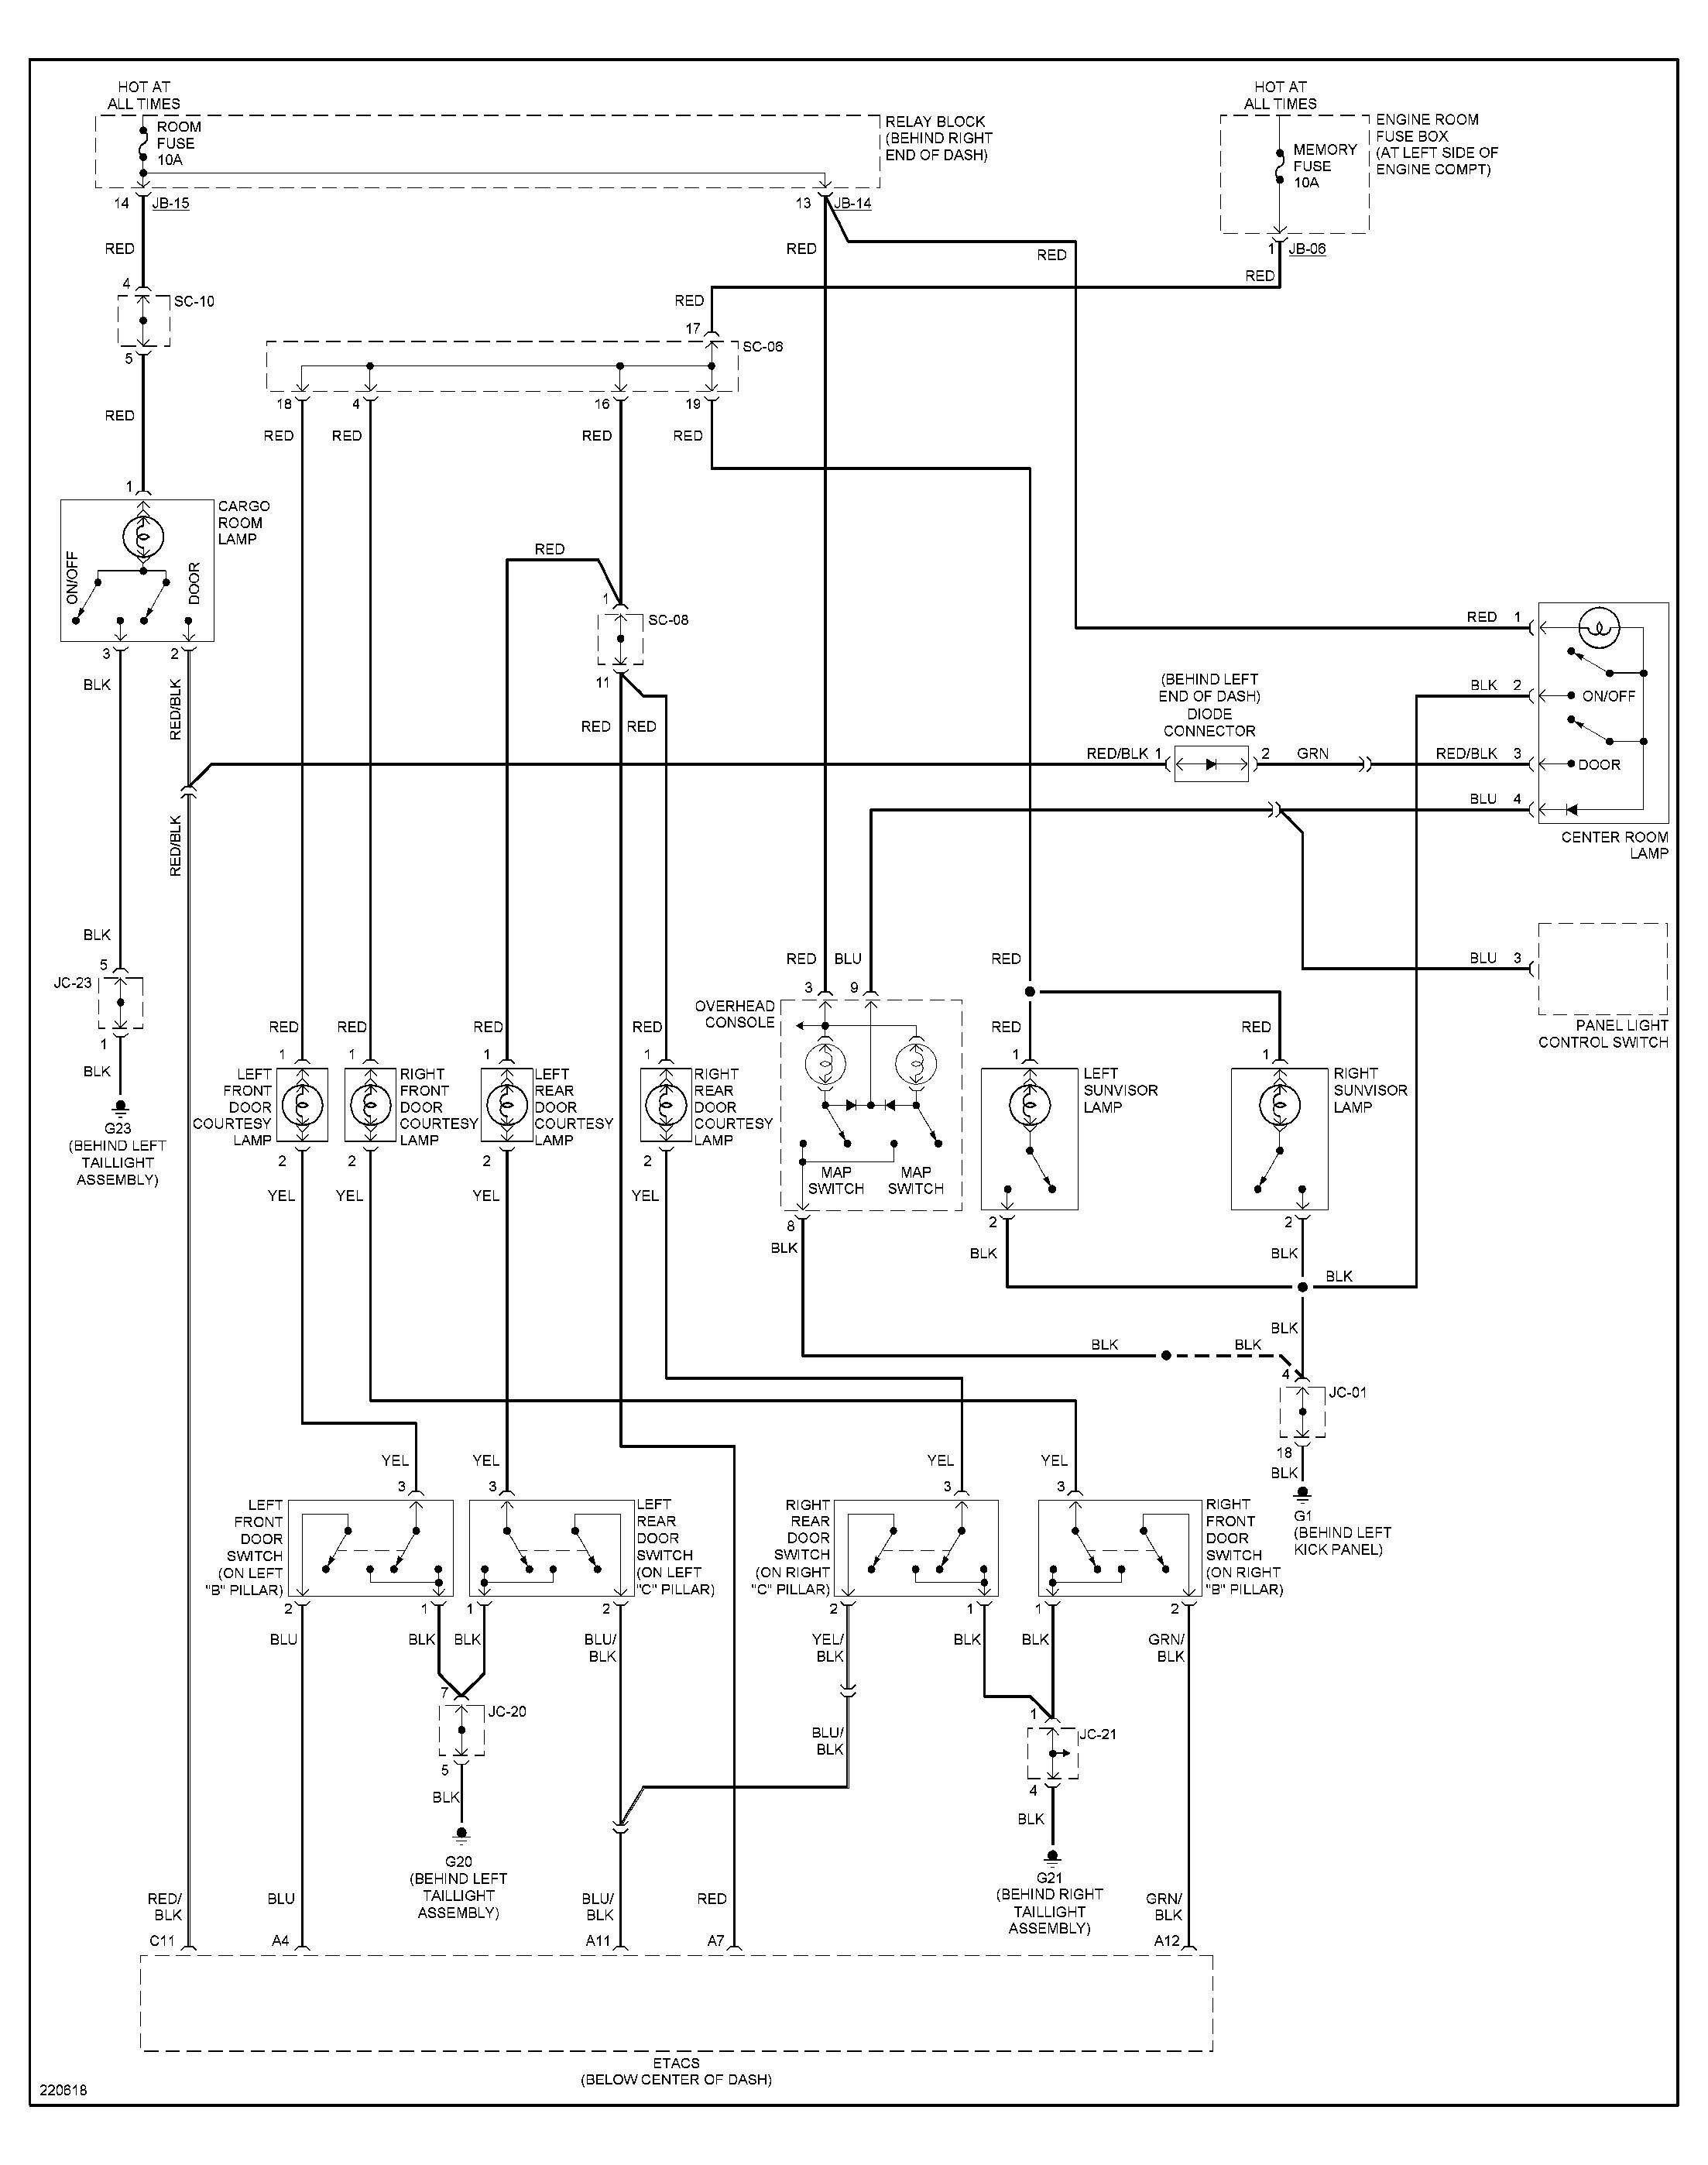 DIAGRAM Kia Sportage Engine Compartment Diagram FULL Version HD Quality  Compartment Diagram - SPICYSCHEMATICSL.RONAN-KERDUDOU.FR [ 2534 x 2000 Pixel ]